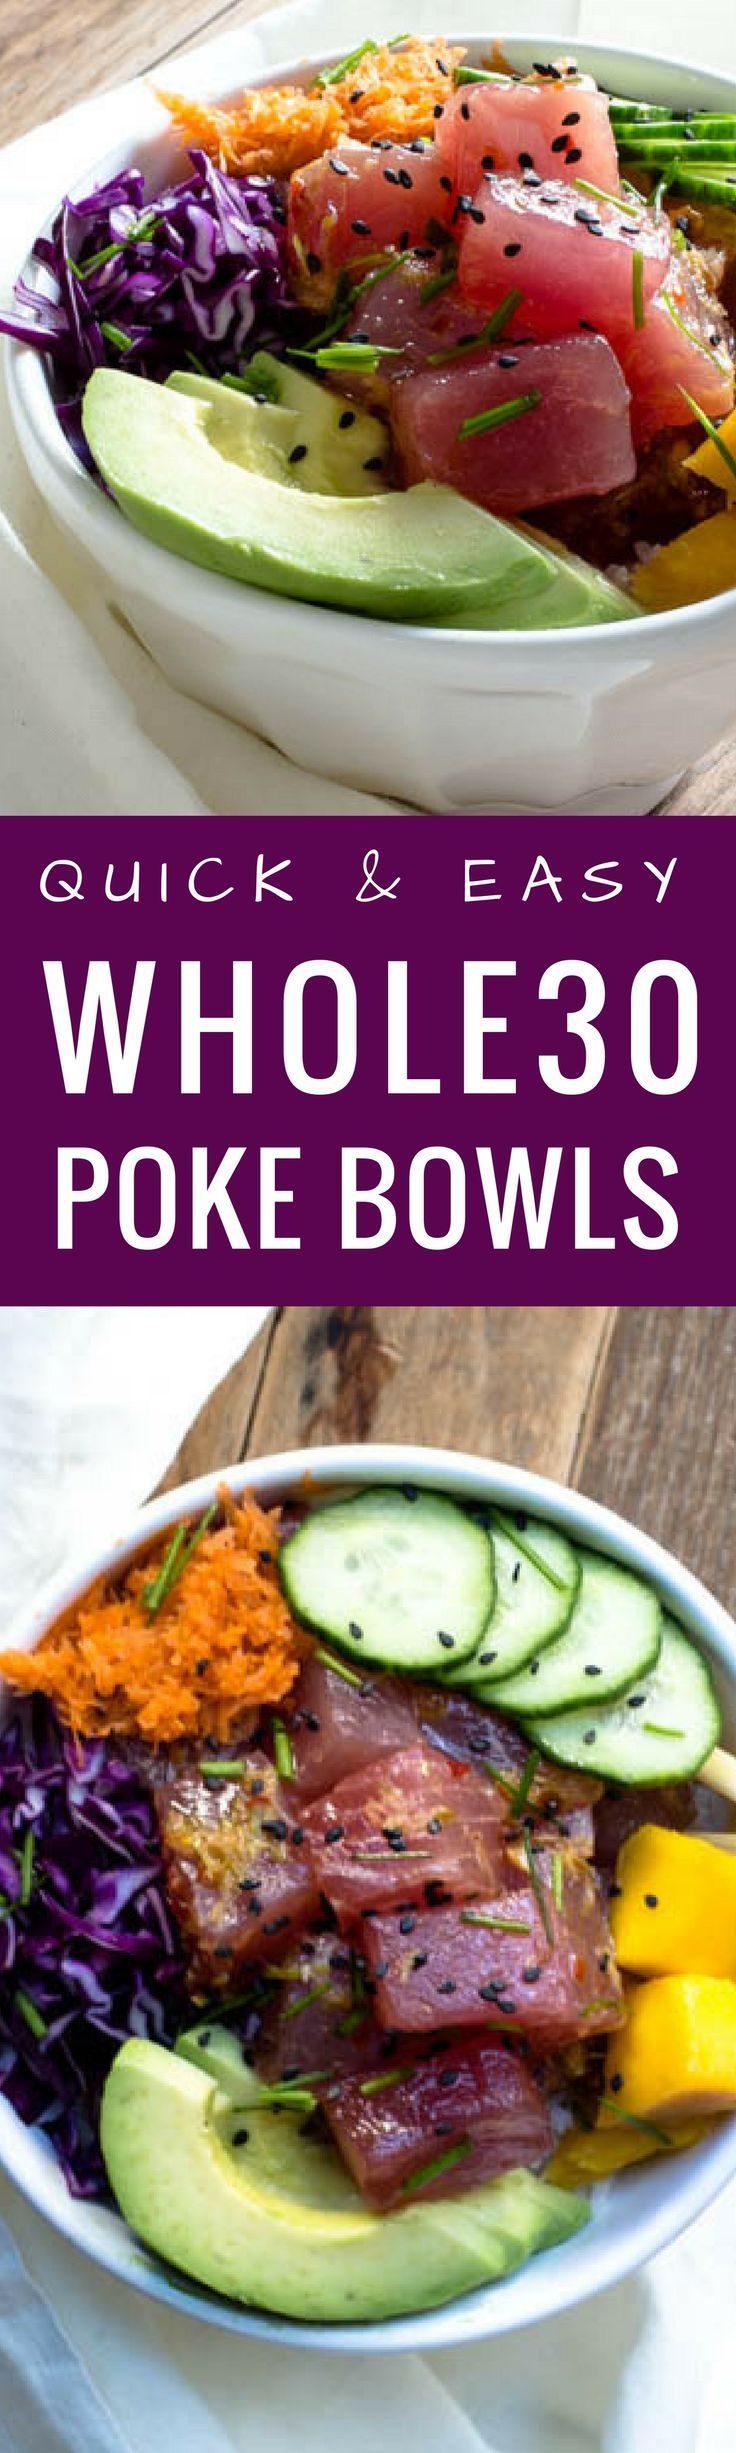 Quick and easy poke bowls recipe. Paleo poke bowls. Healthy, homemade, gluten free poke bowl recipe. Tuna poke bowls. How to make the perfect poke bowl at home! Whole30 poke recipe. Easy whole30 dinner. Whole30 recipes.  via @themovementmenu